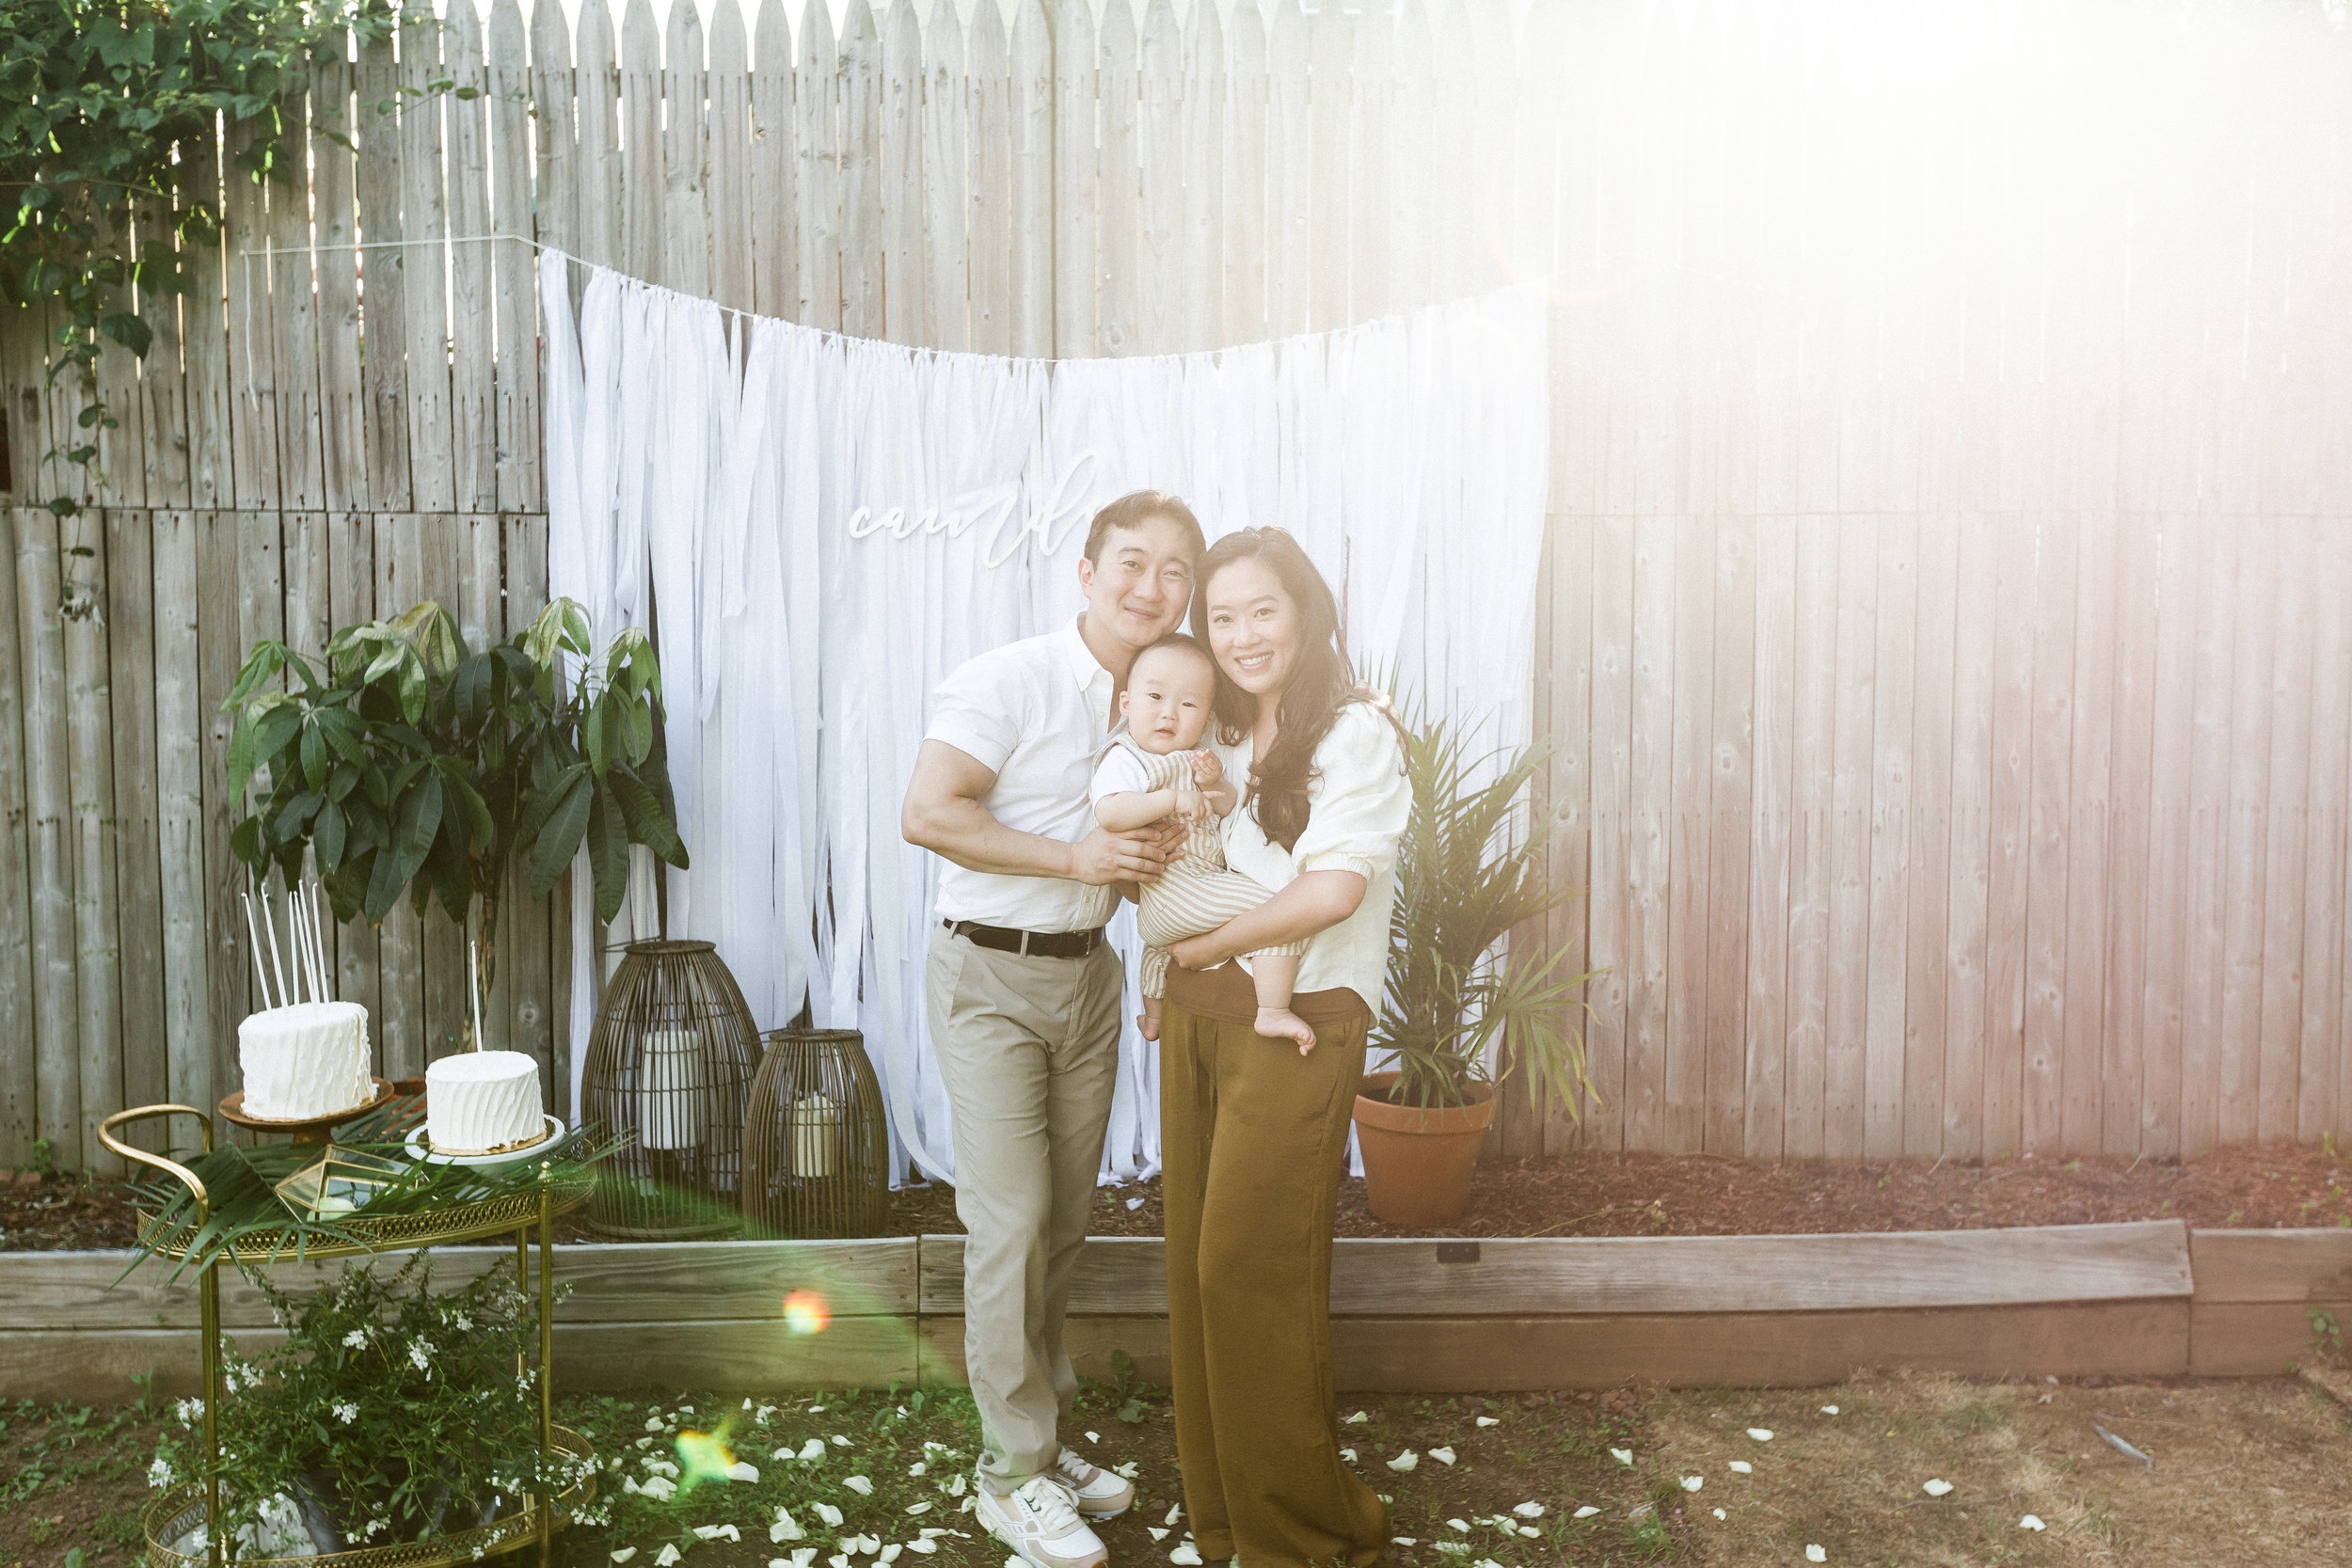 lissie-loomis-photo-nyc-family-photographer-brooklyn-baby34.JPG